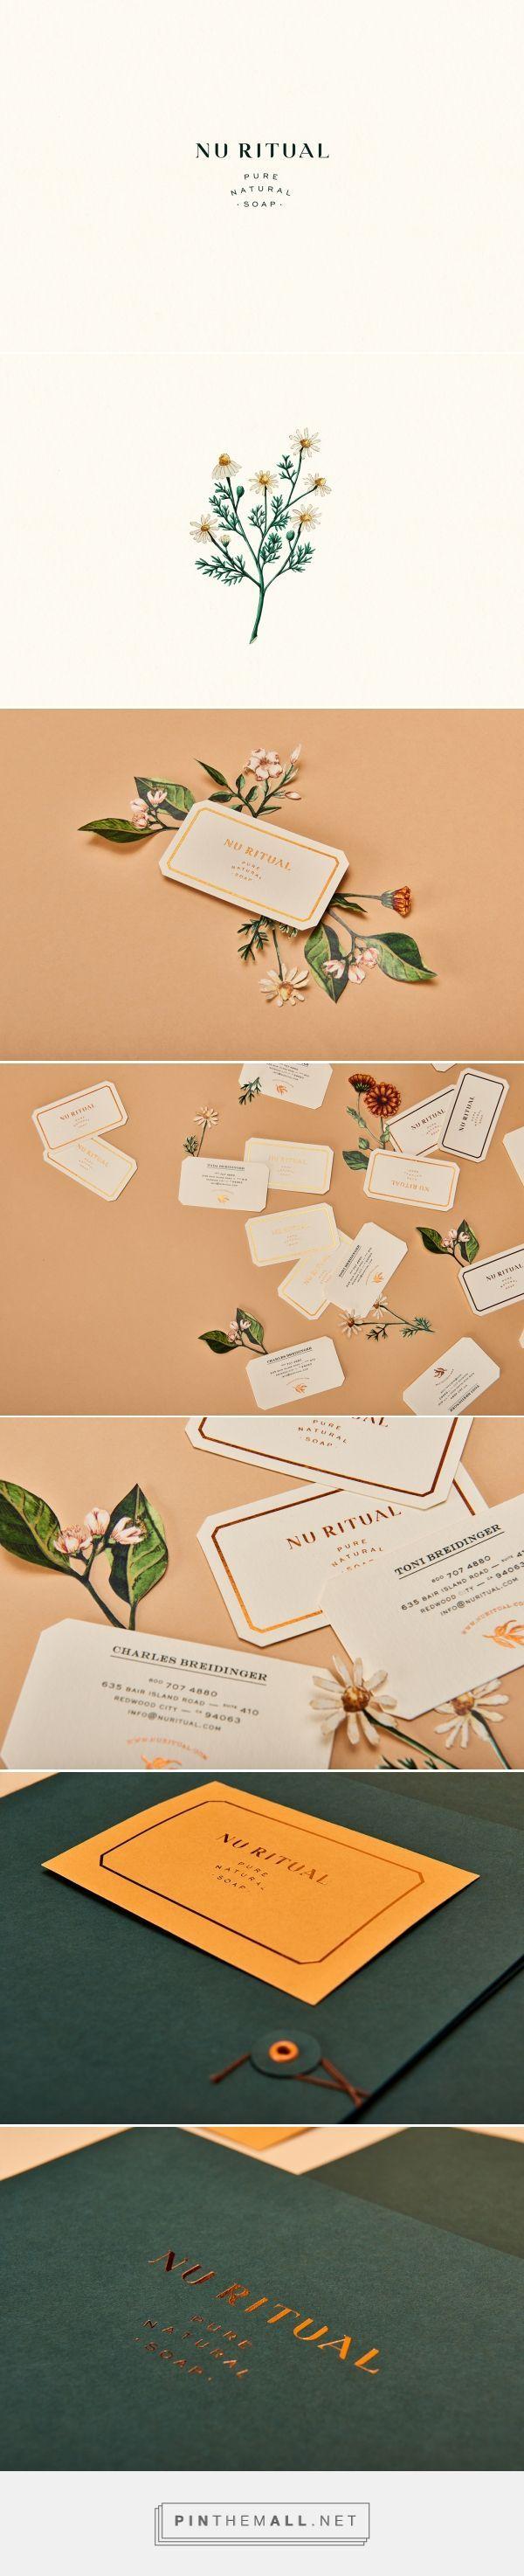 nu ritual / branding, print design, business cards, natural soap, logo design